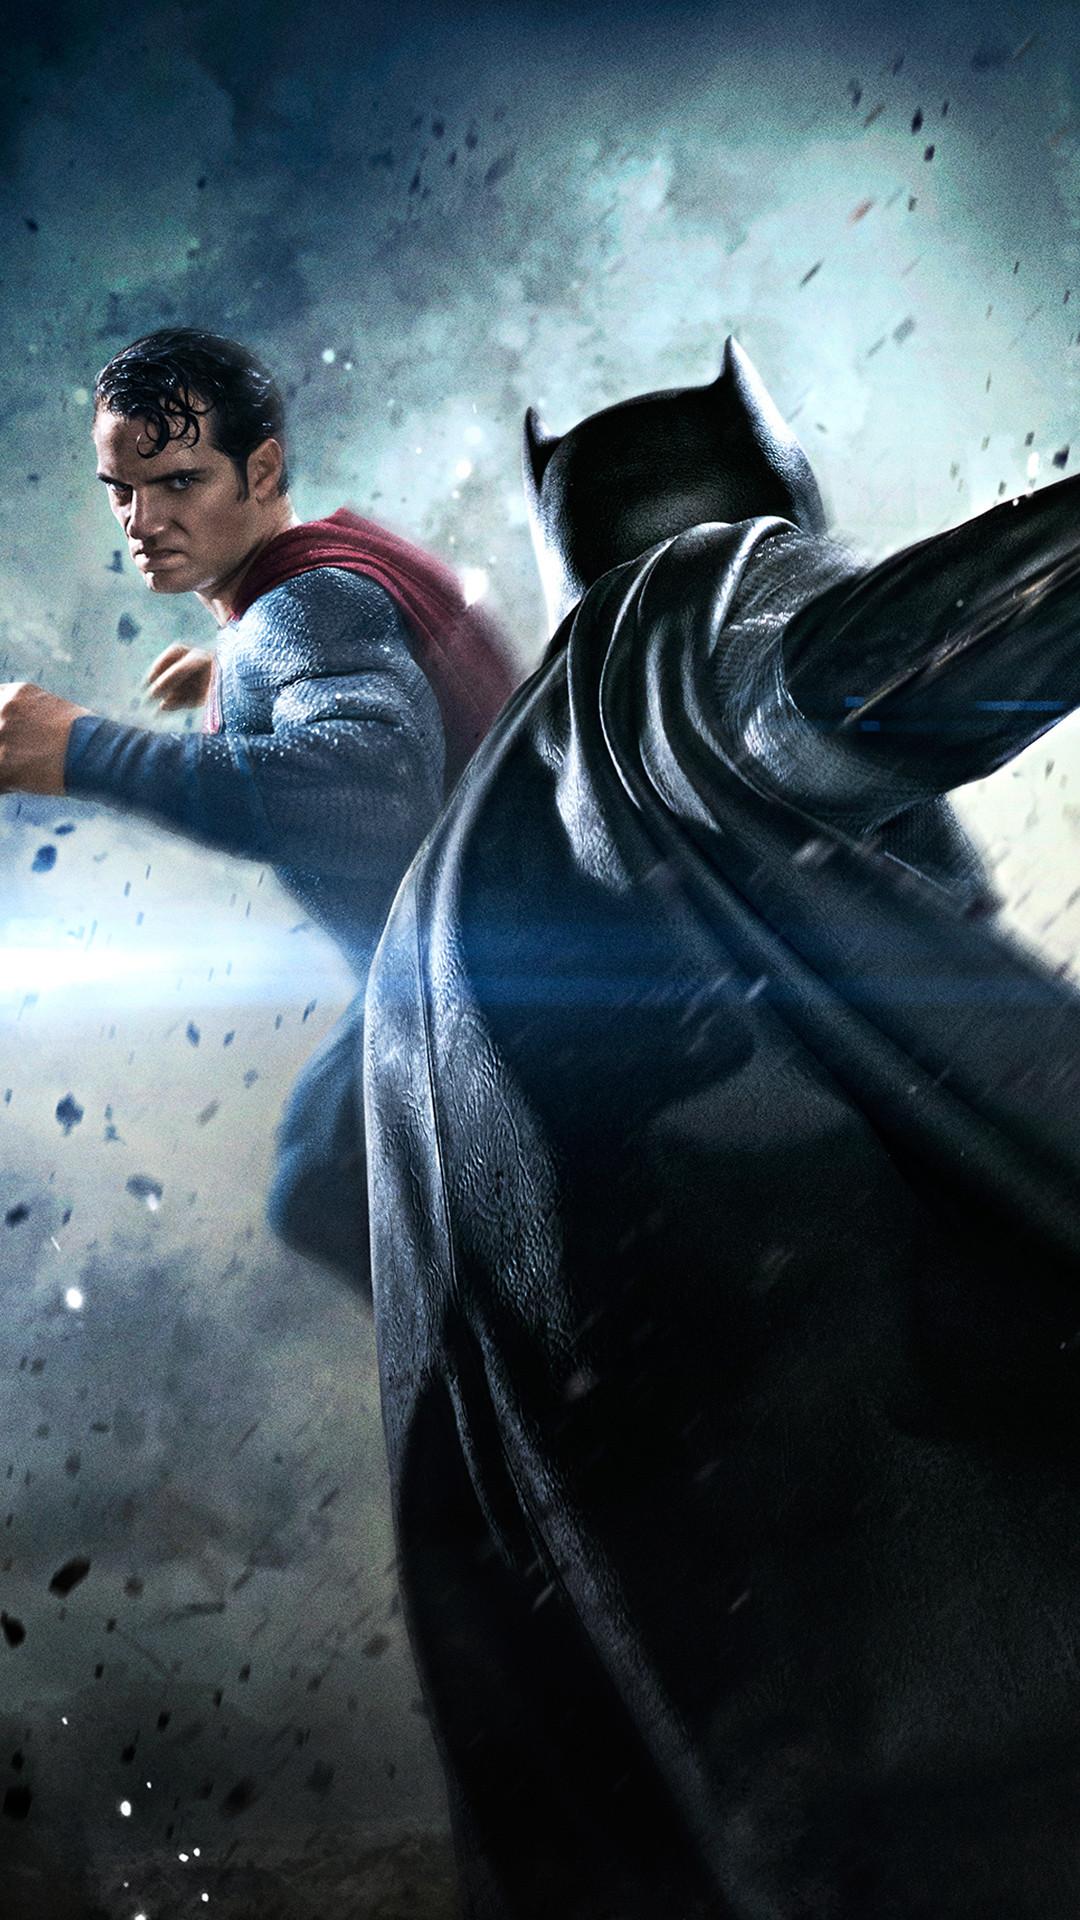 Batman vs Superman Movie Fight iPhone 6 Plus HD Wallpaper iPhone Lockscreen  Image